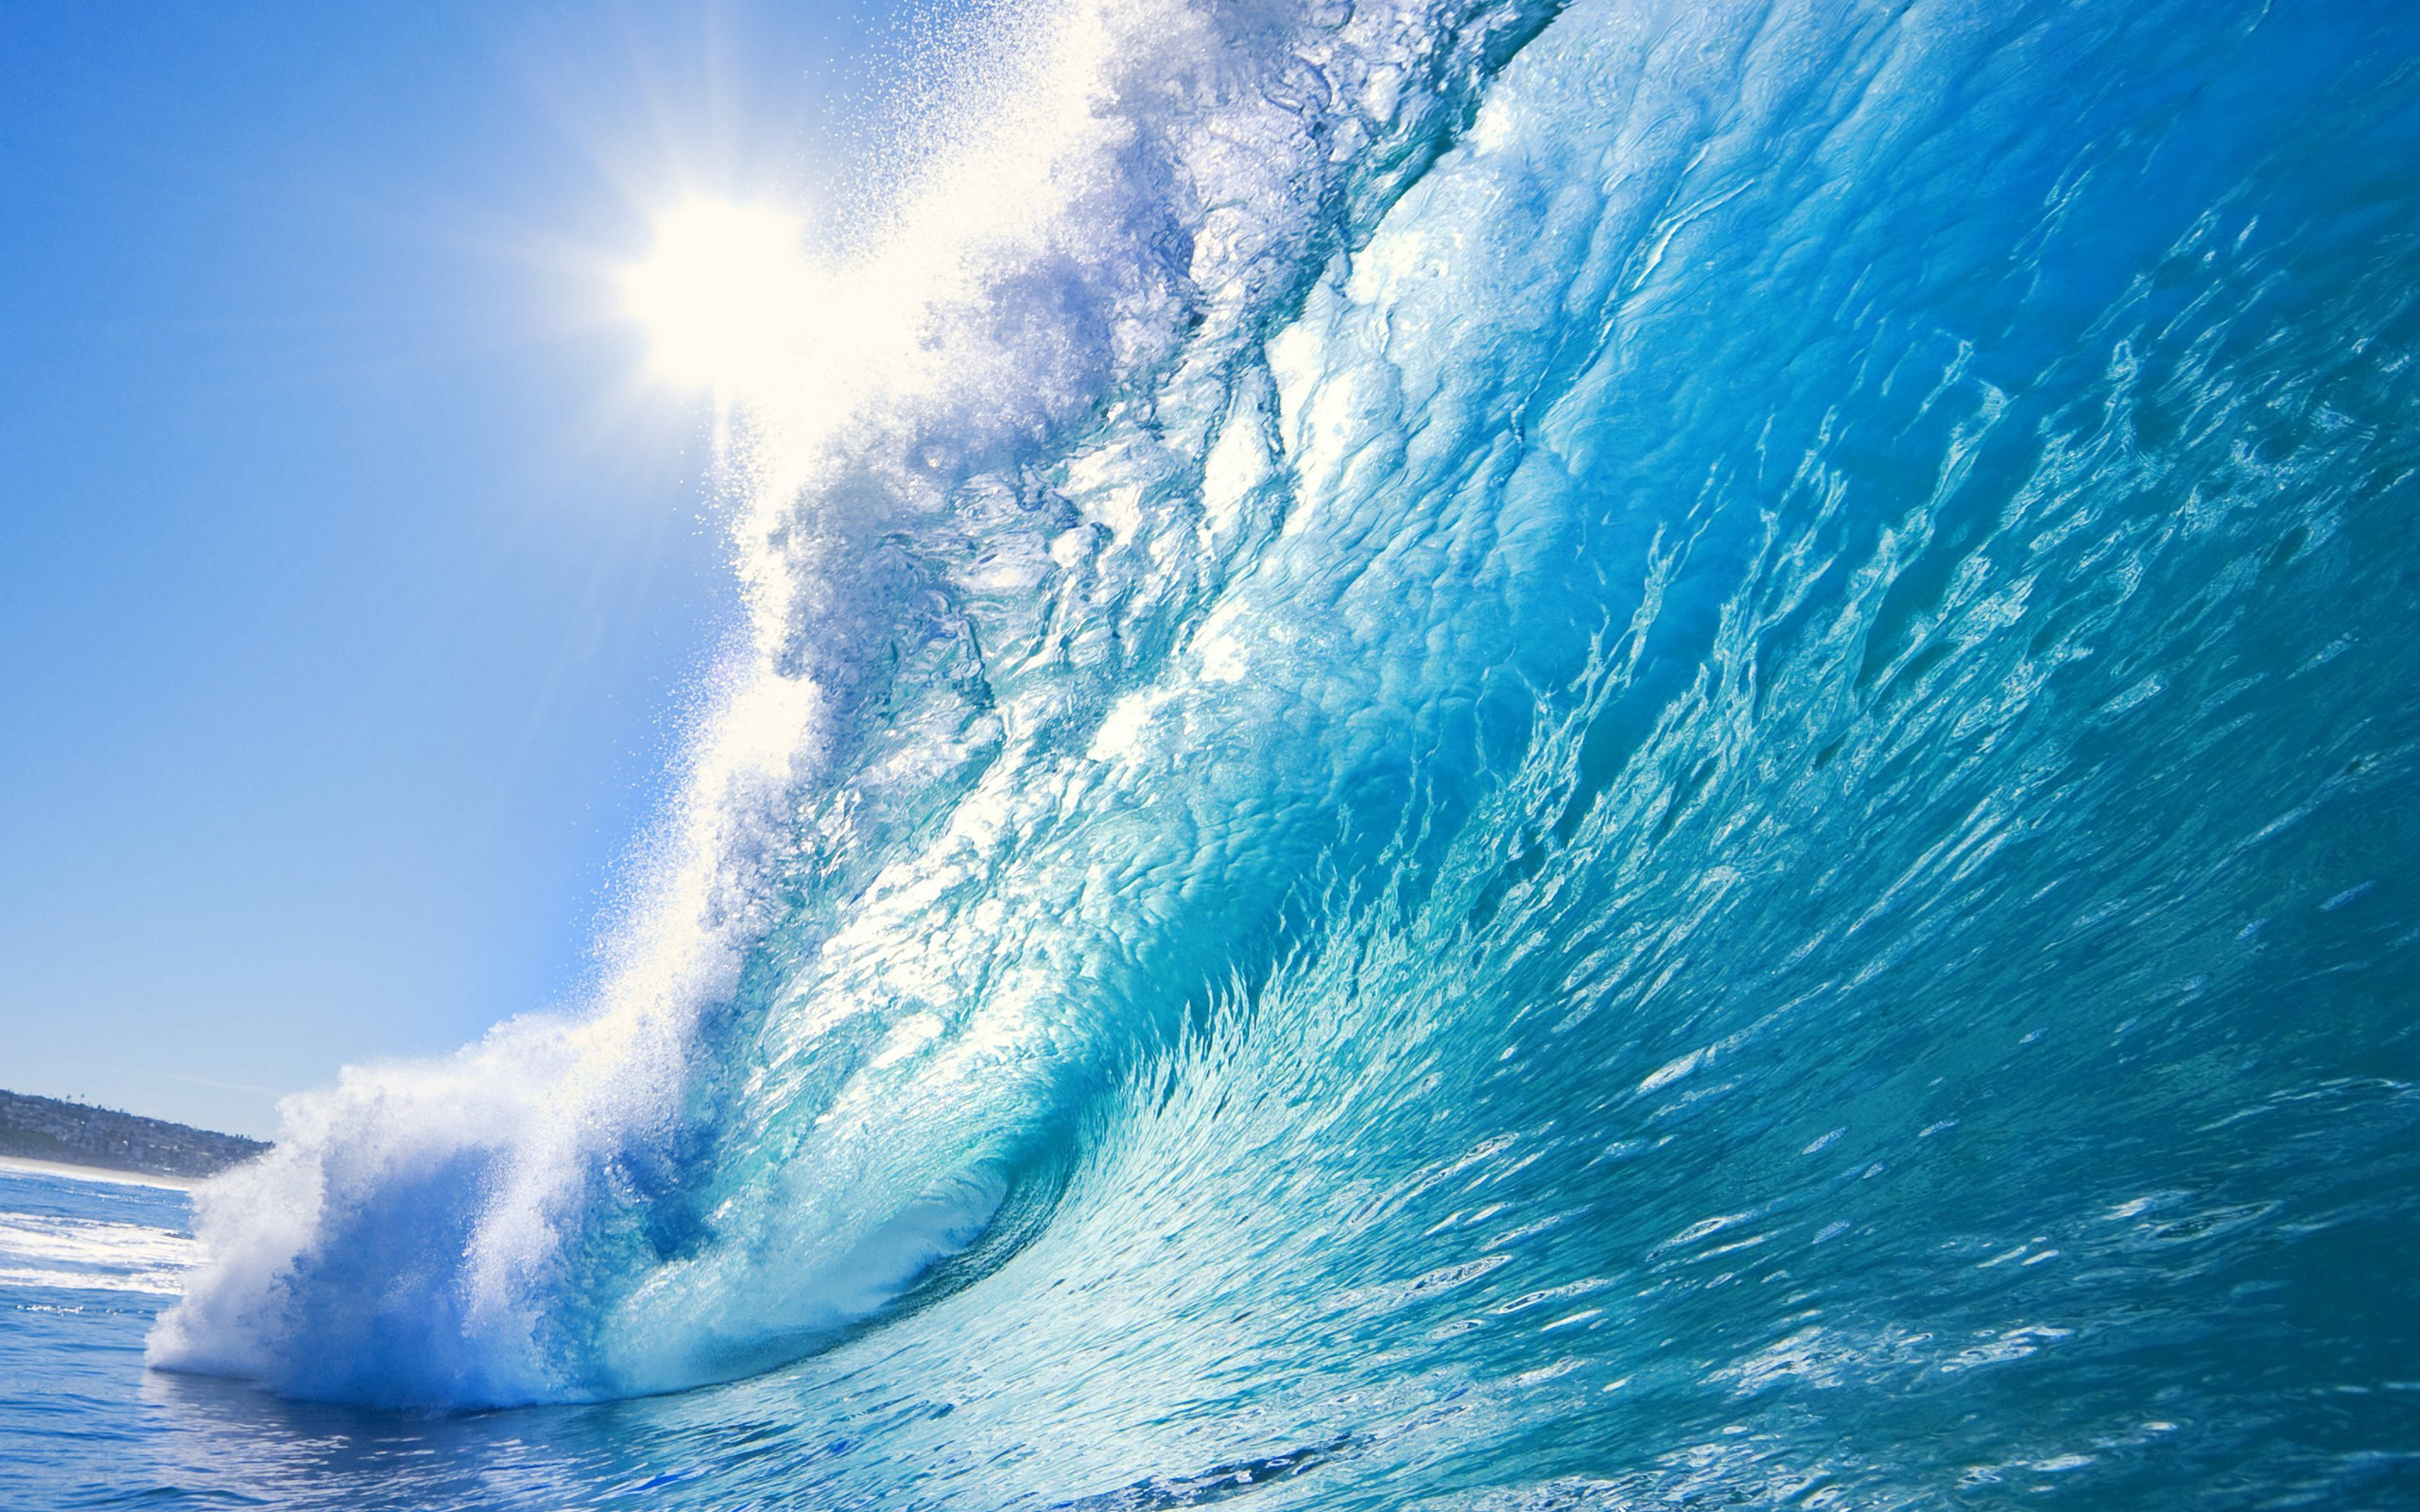 water splash wallpaper 917033 water splash wallpaper 916995 water 2560x1600